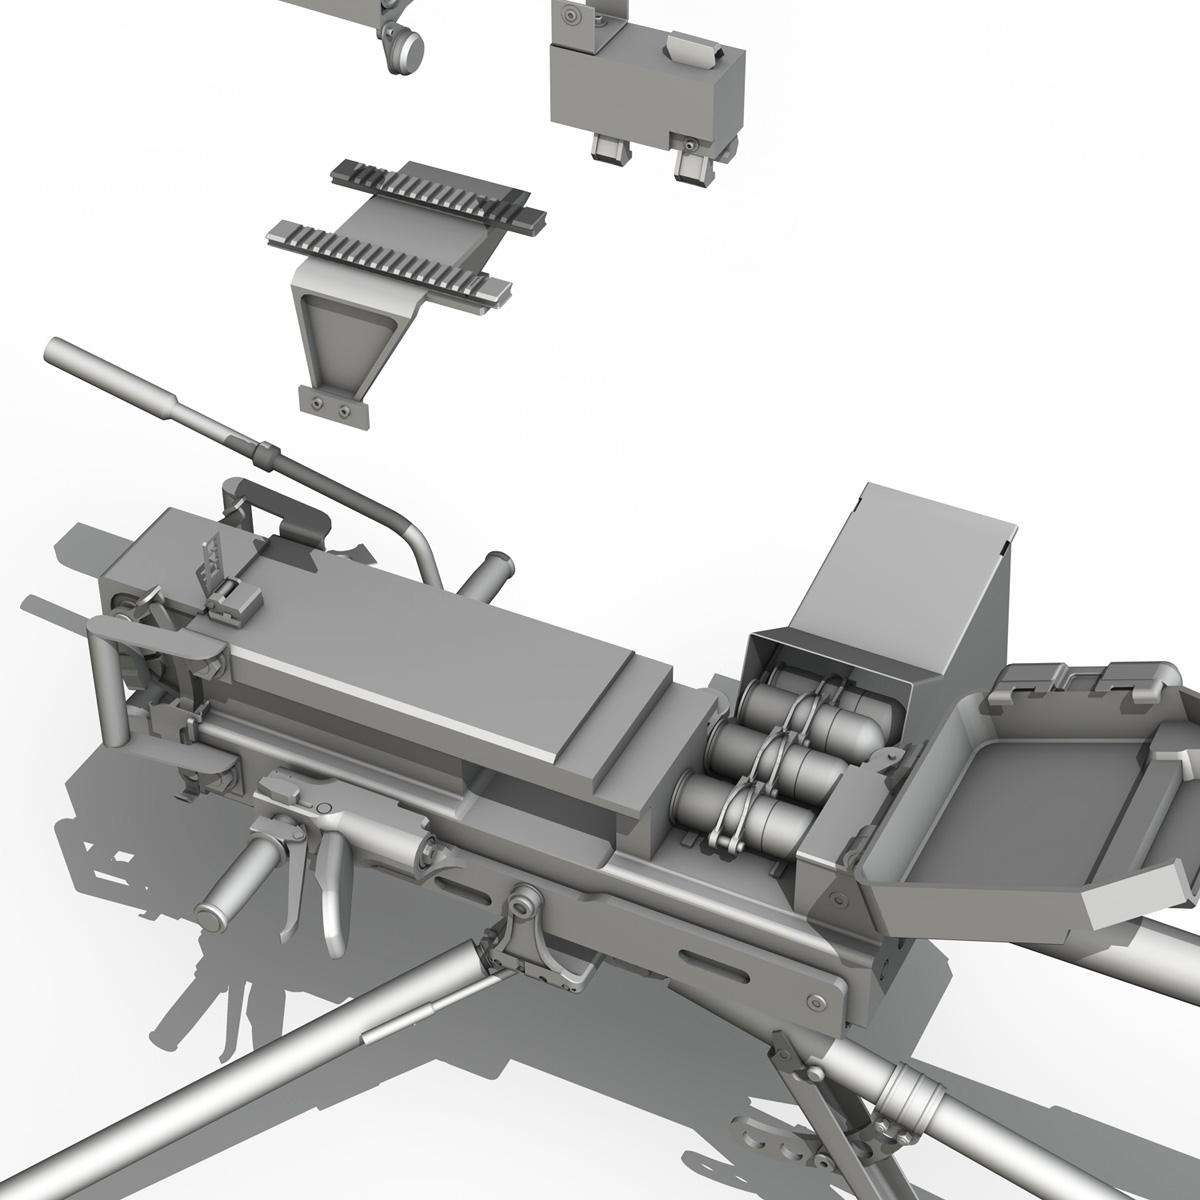 40mm qumbara pulemyotu gmg 3d model c4d lwo 3dm obj 264304